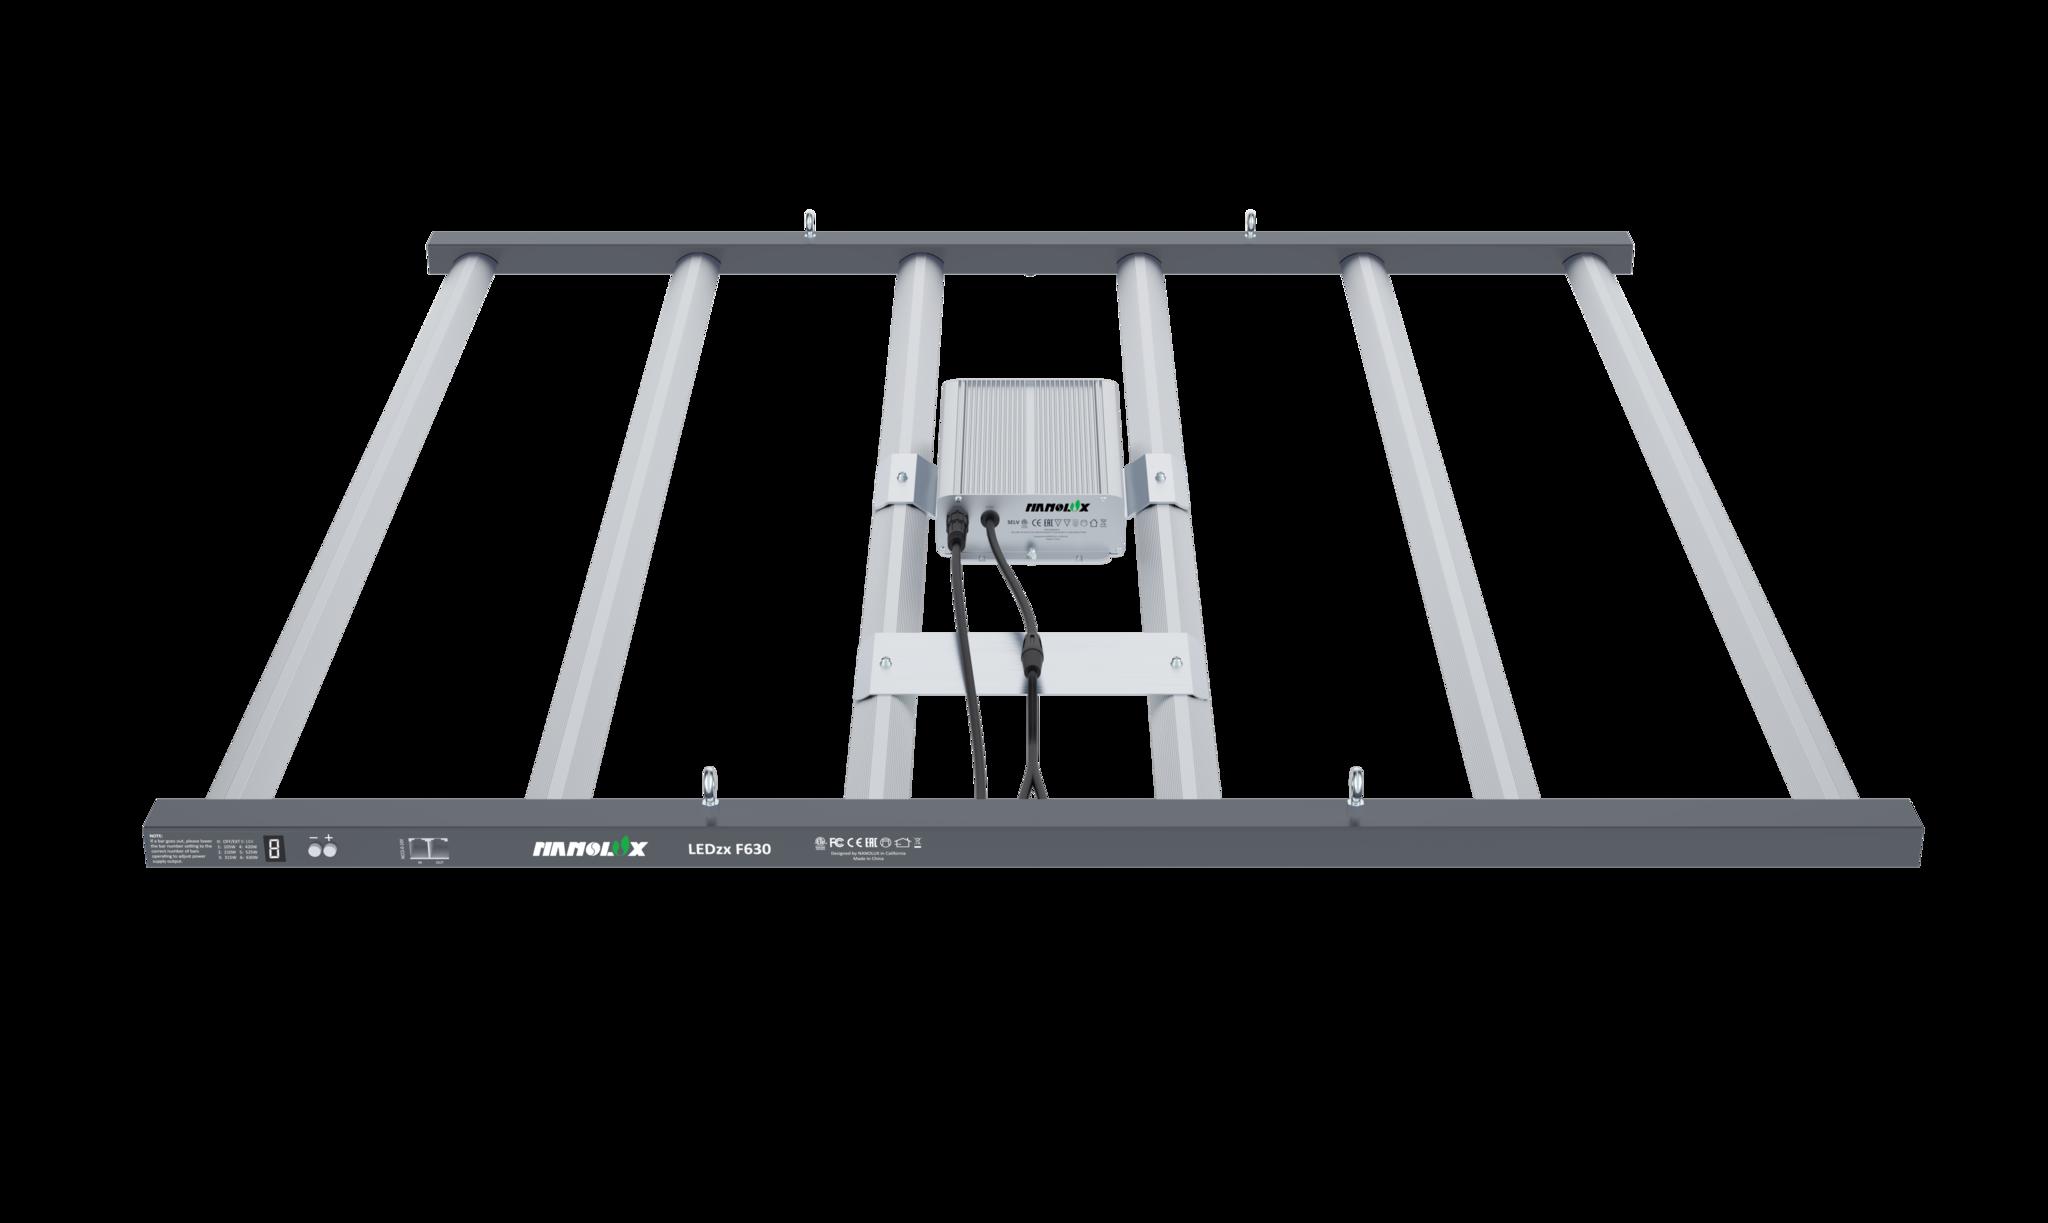 Nanolux Nanolux - LEDzx F630, 630w 6 bar fixture 120-277v